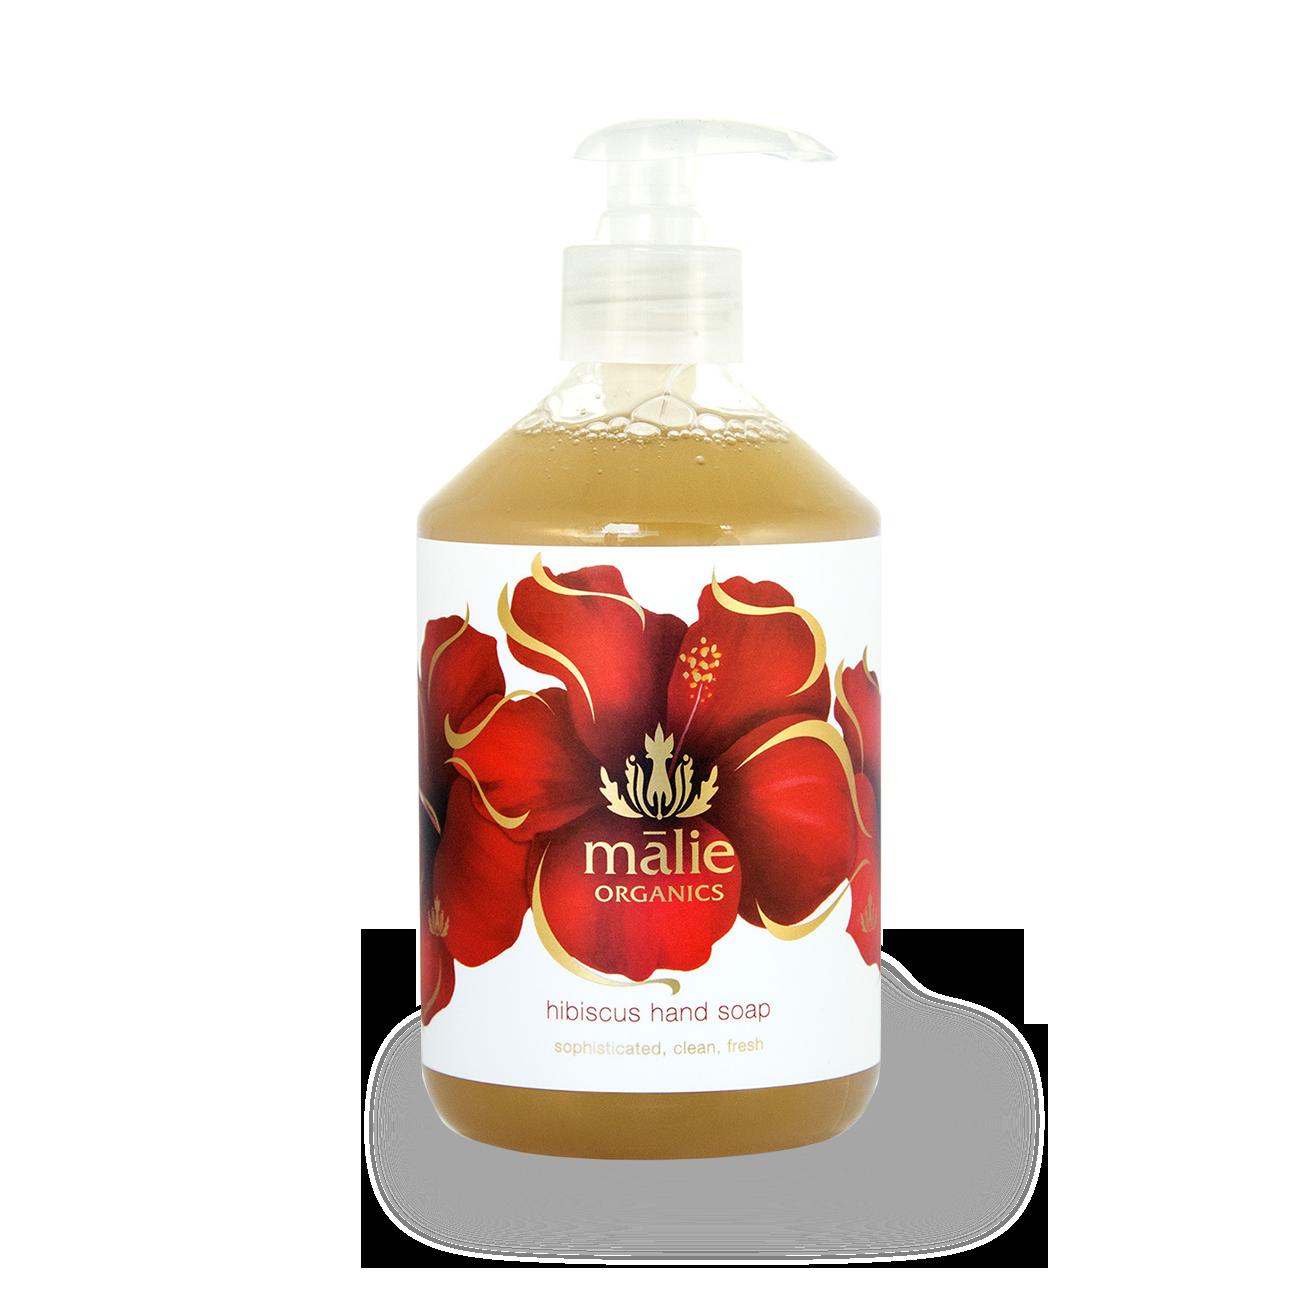 Hibiscus Hand Soap